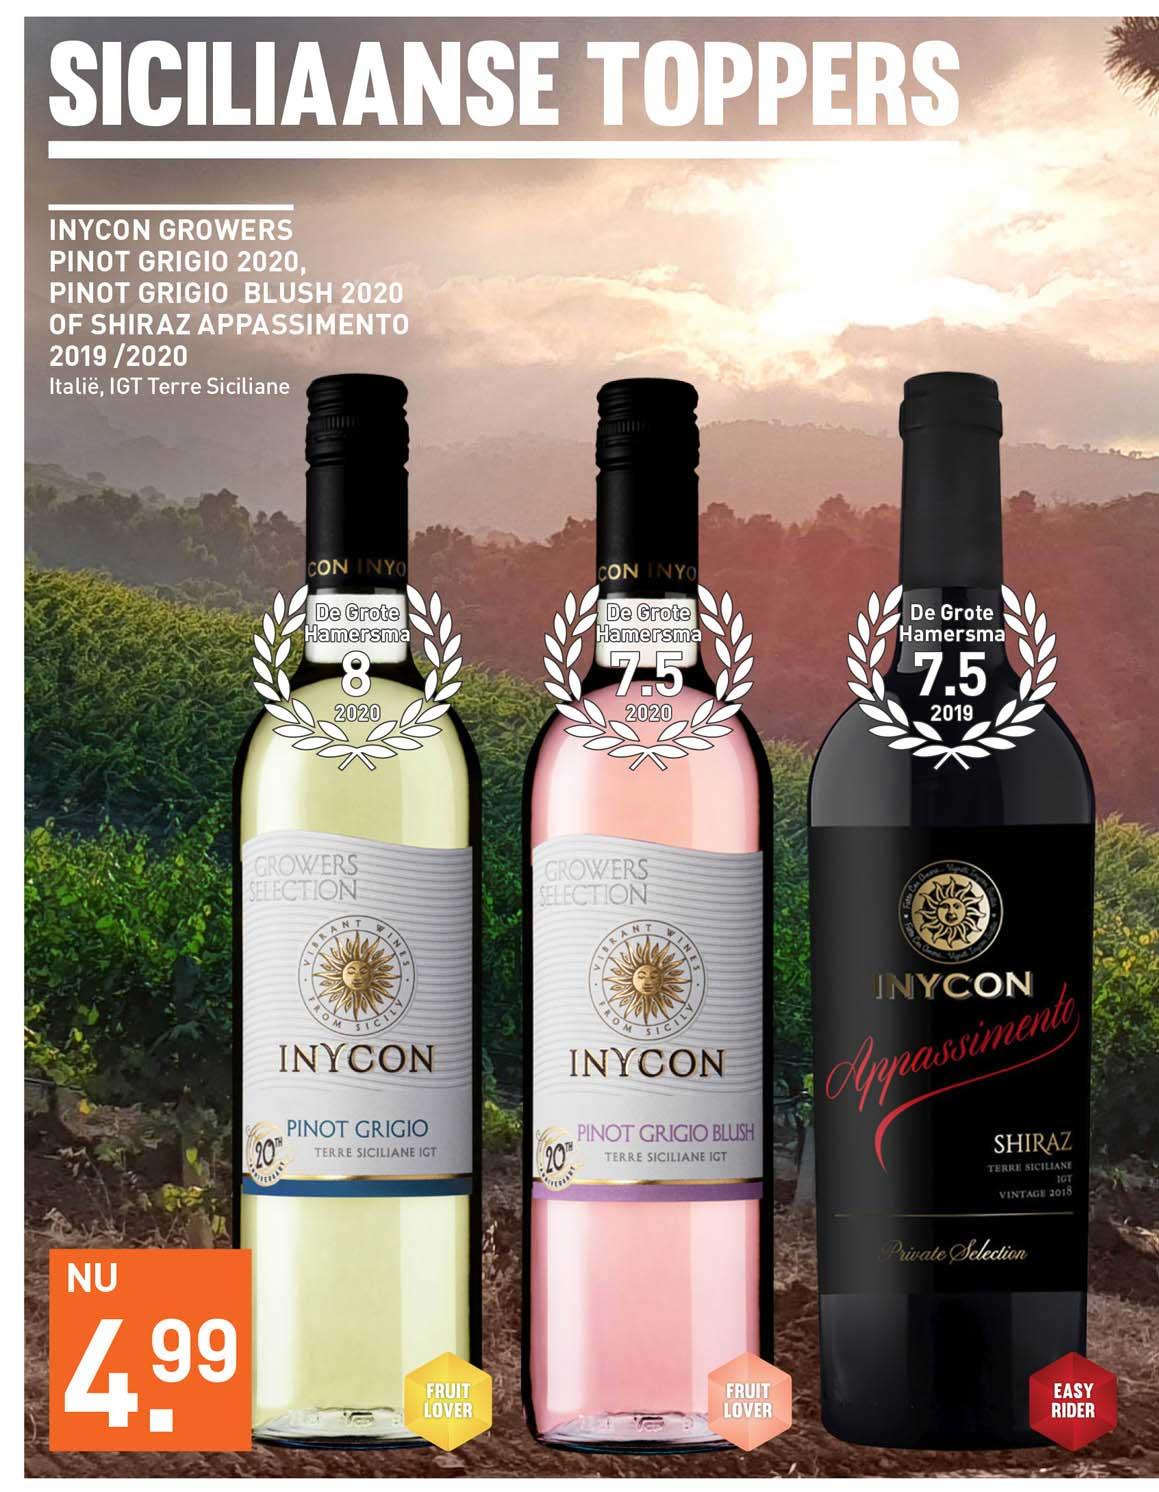 Gall & Gall Inycon Growers Pinot Grigio 2020, Pinot Grigio Blush 2020 Of Shiraz Appassimento 2019 - 2020